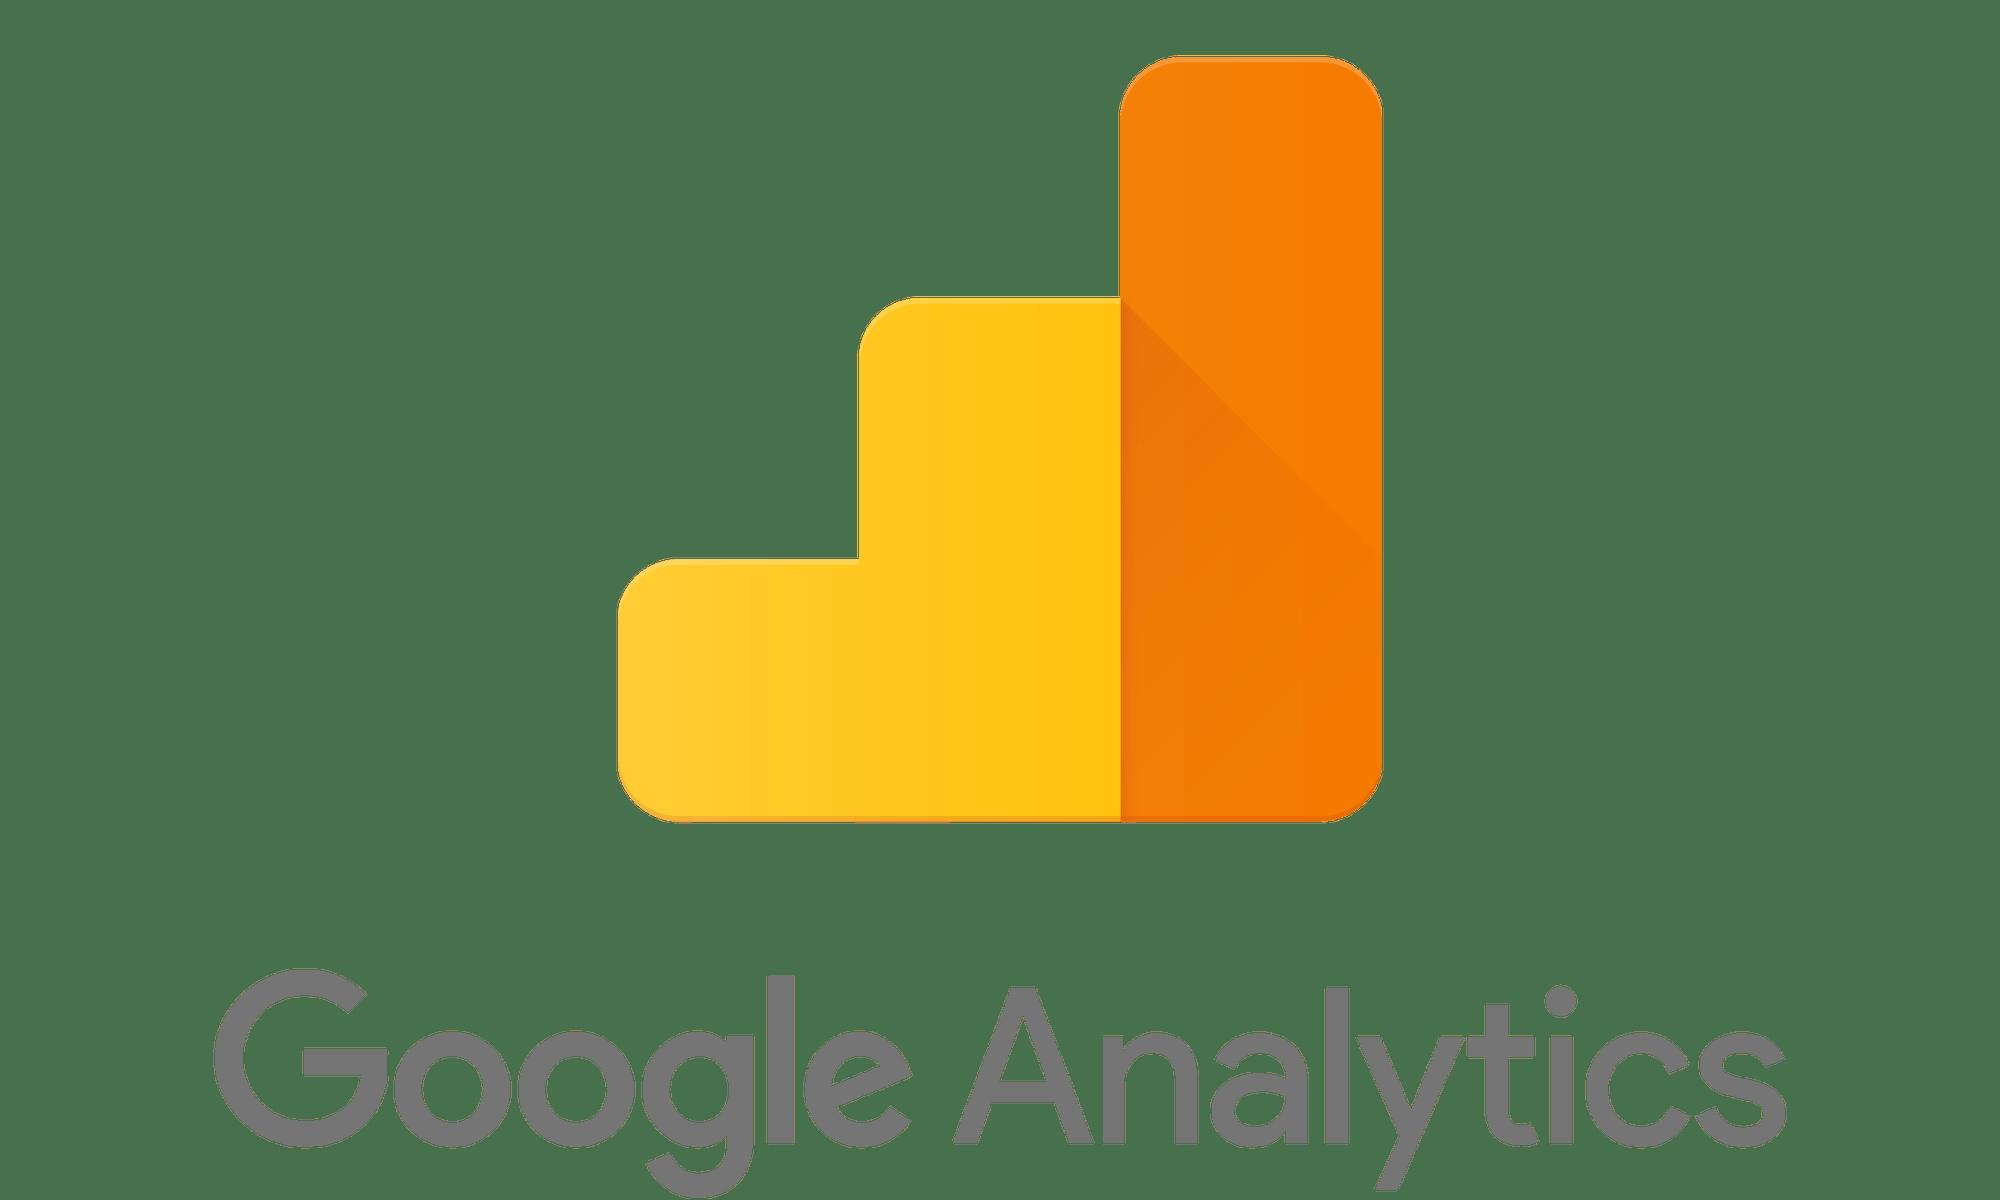 Oktopost Google Analytics integration